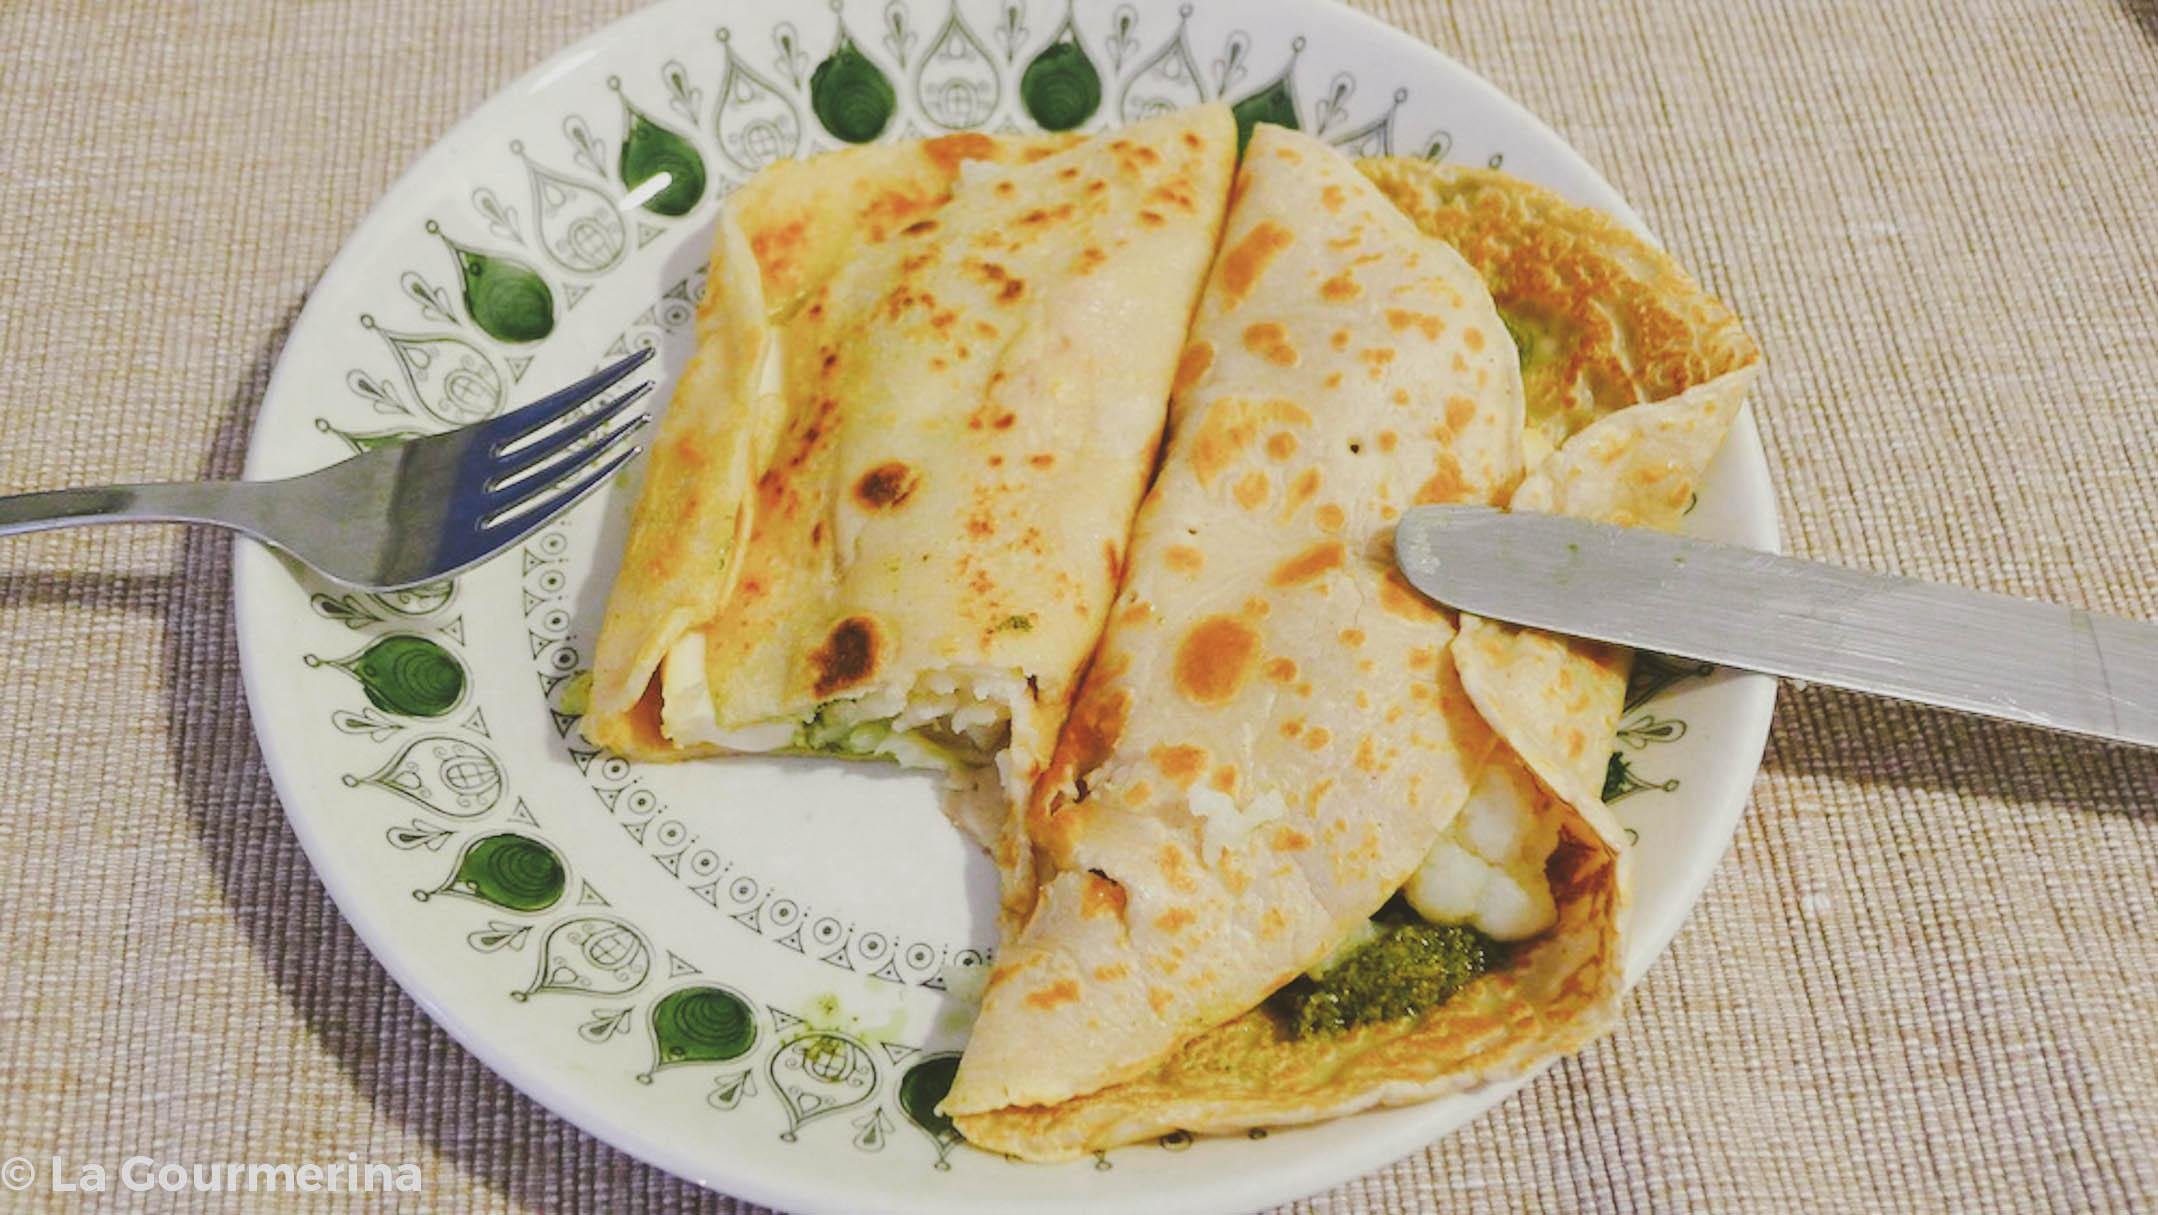 histaminfreie pfannkuchen omeletten cr pes la gourmerina. Black Bedroom Furniture Sets. Home Design Ideas